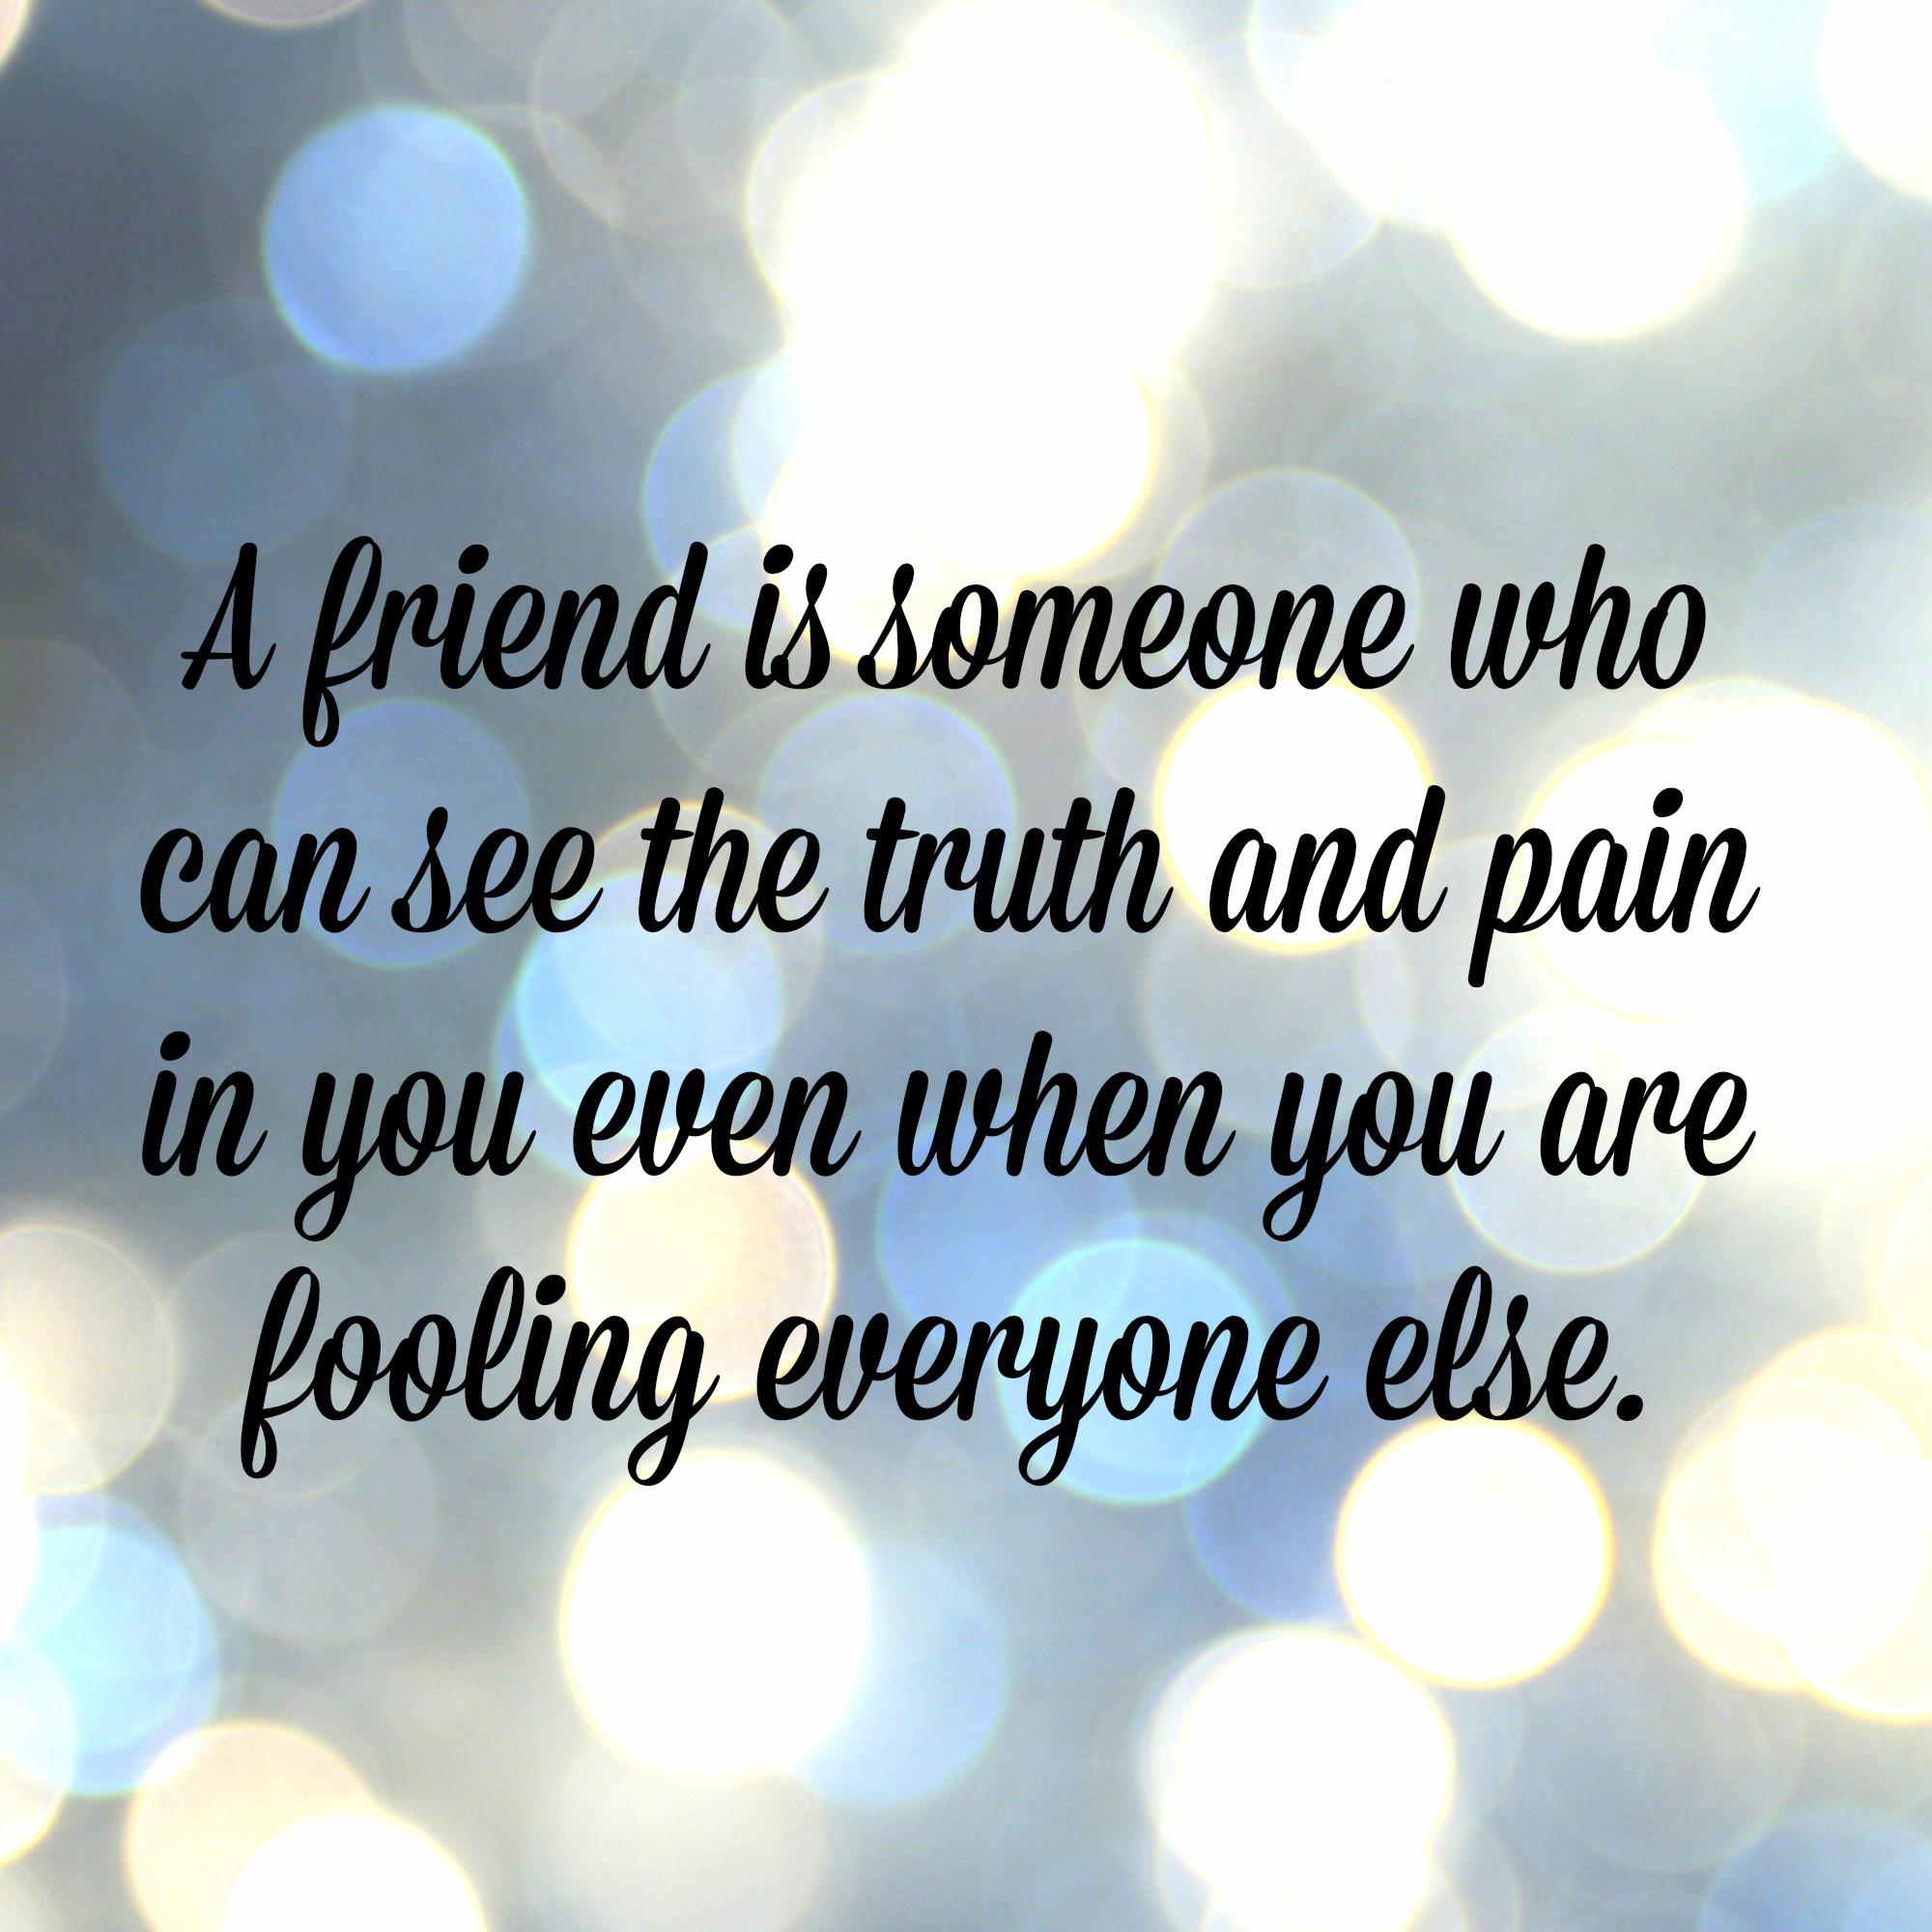 Past Friends Quotes: Quotes About Past Friends. QuotesGram